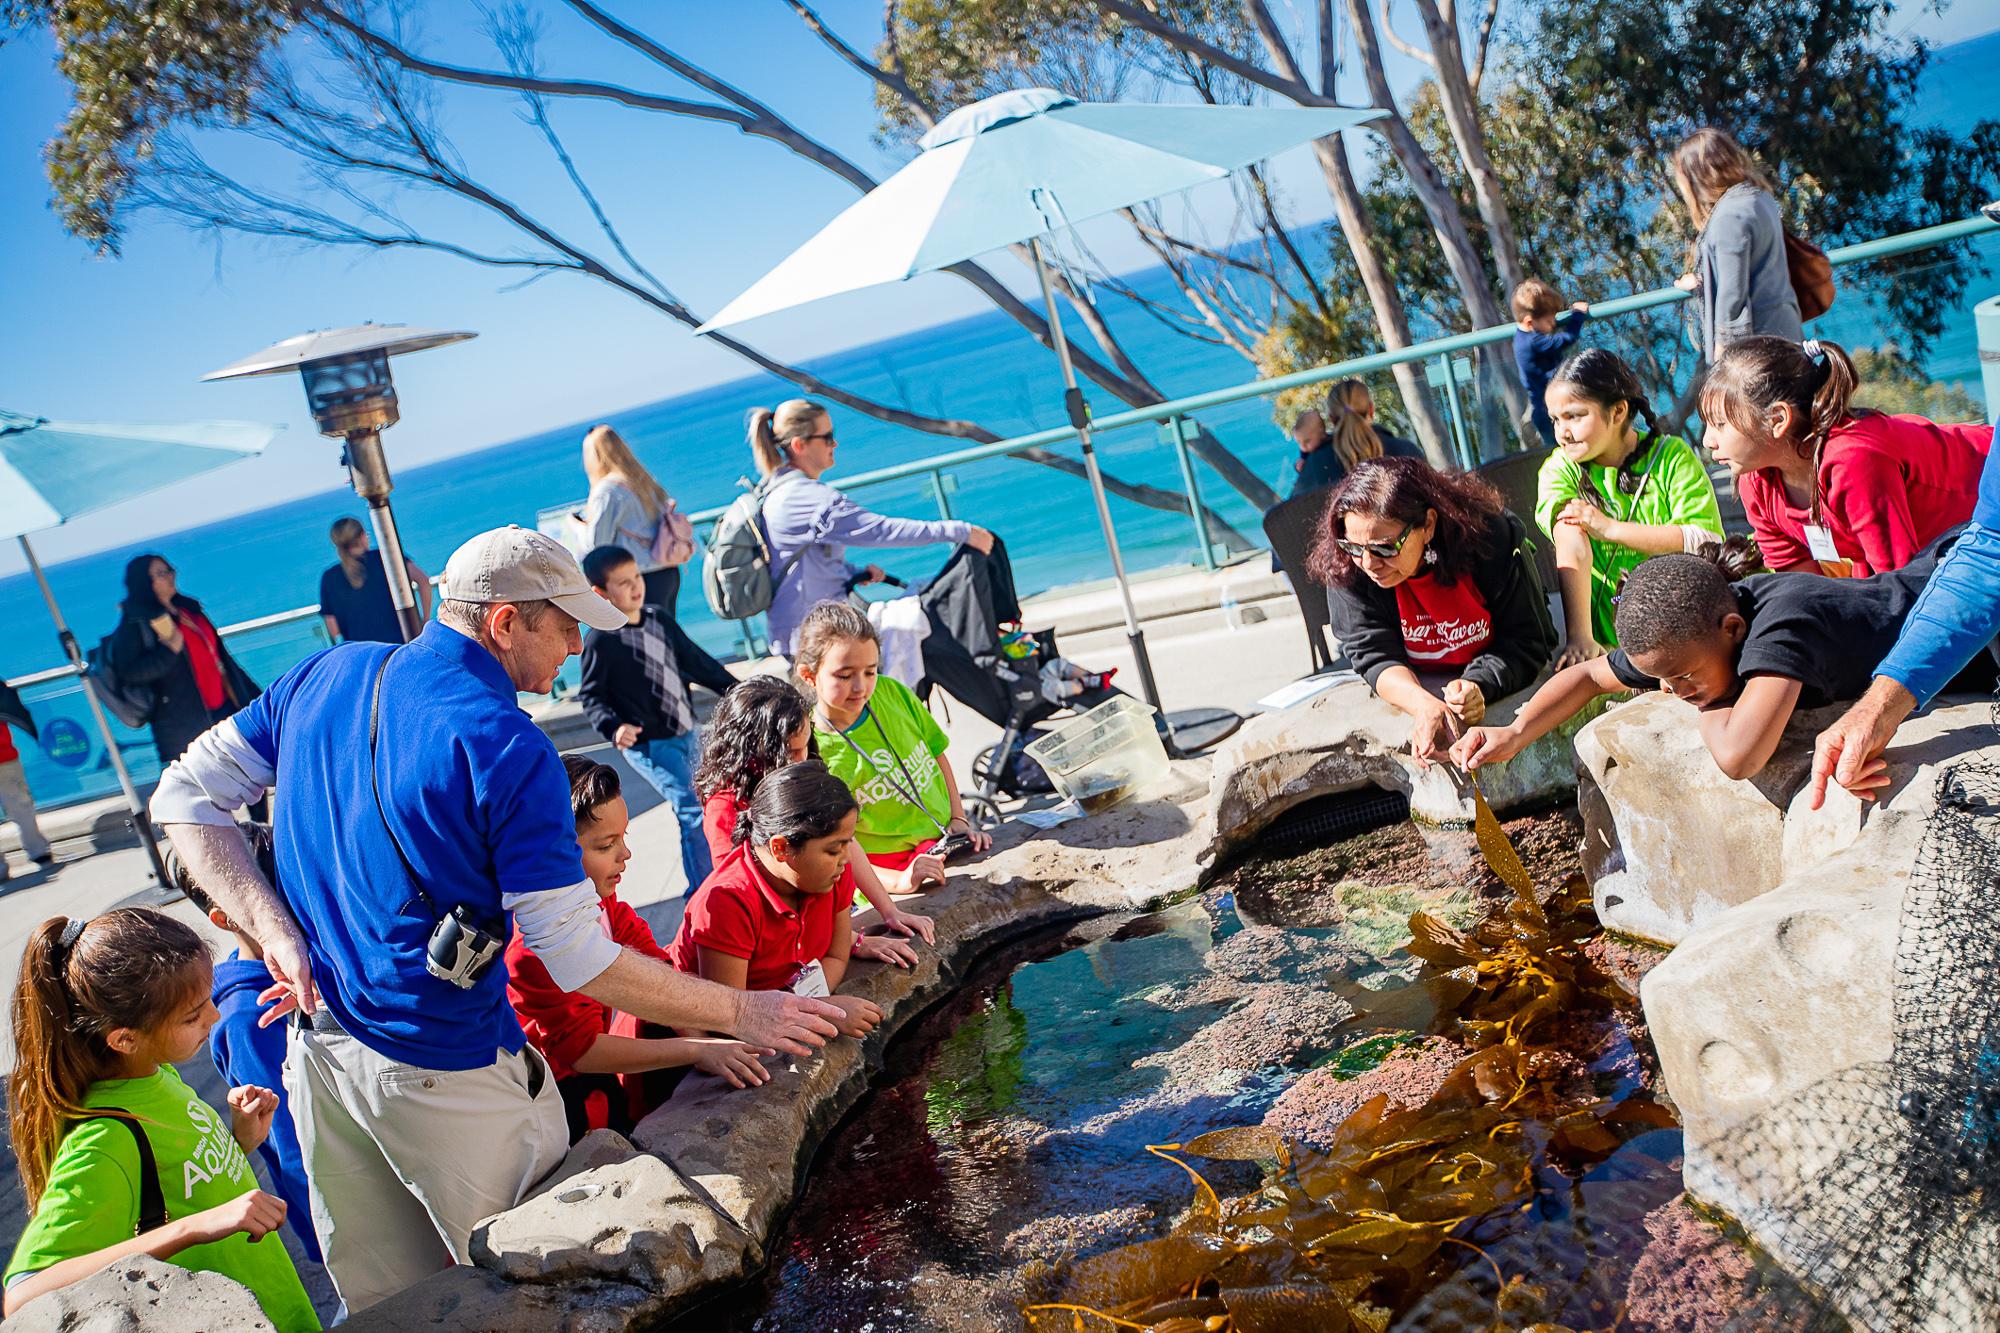 Tide Pool Plaza at San Diego Birch Aquarium